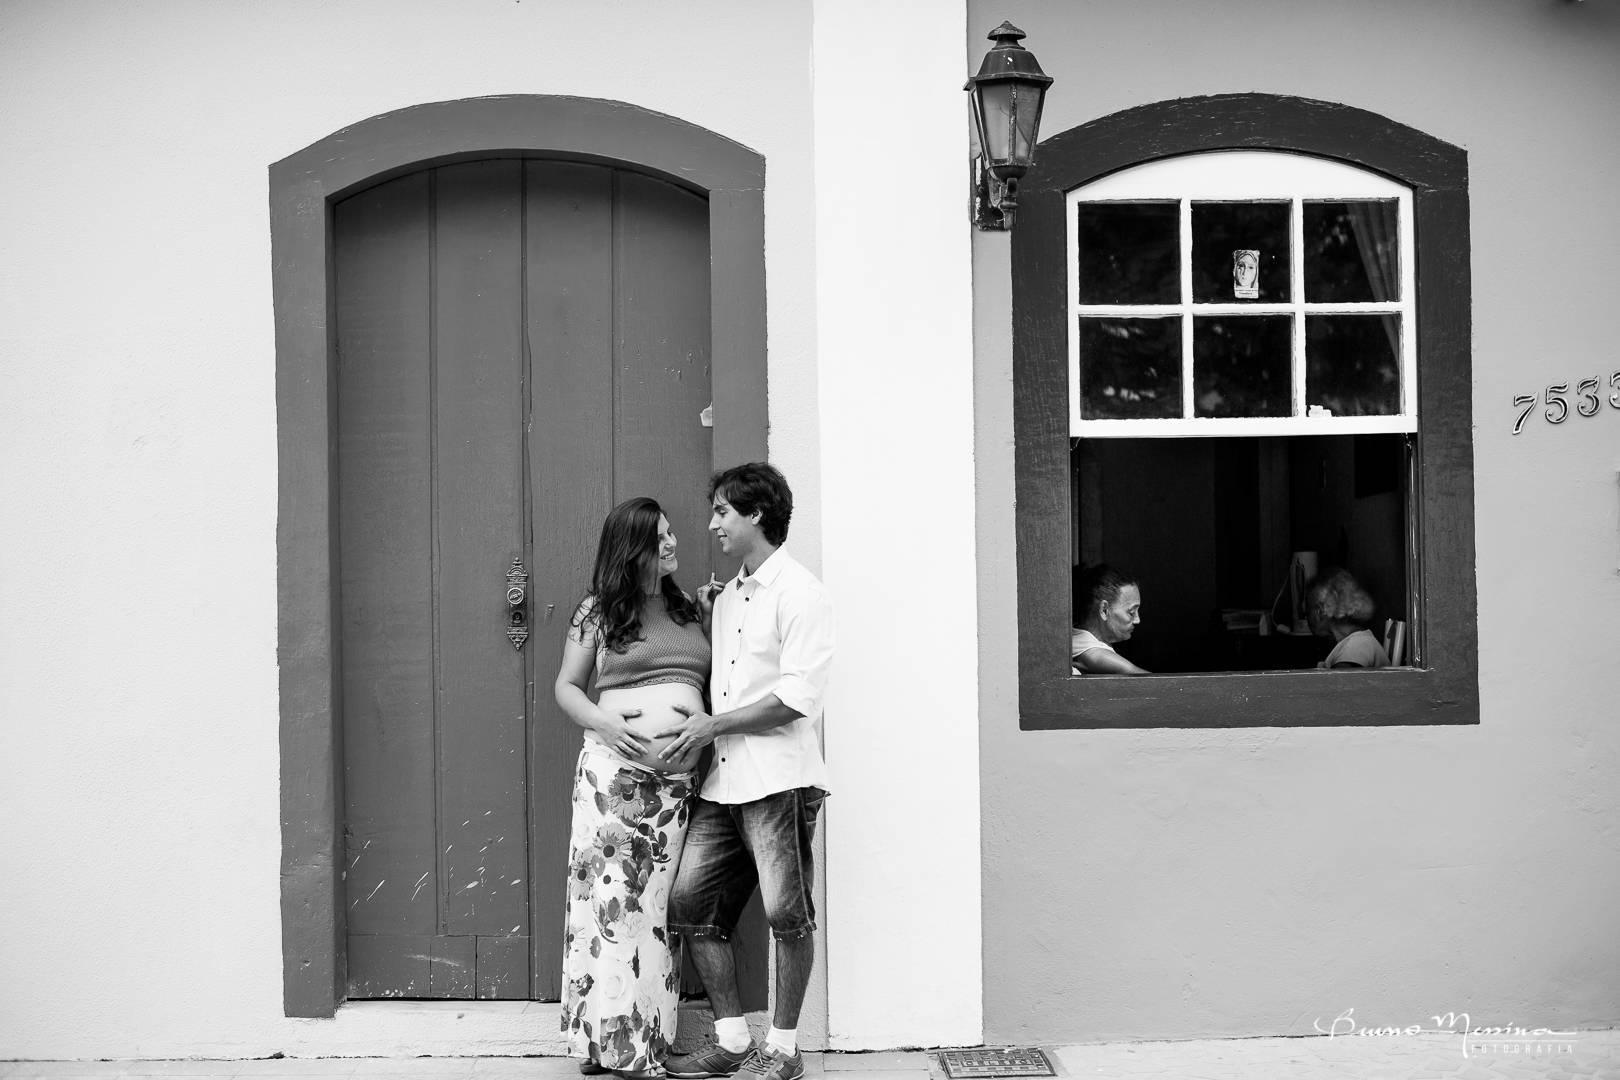 bruno messina casalinghi mauris - photo#32